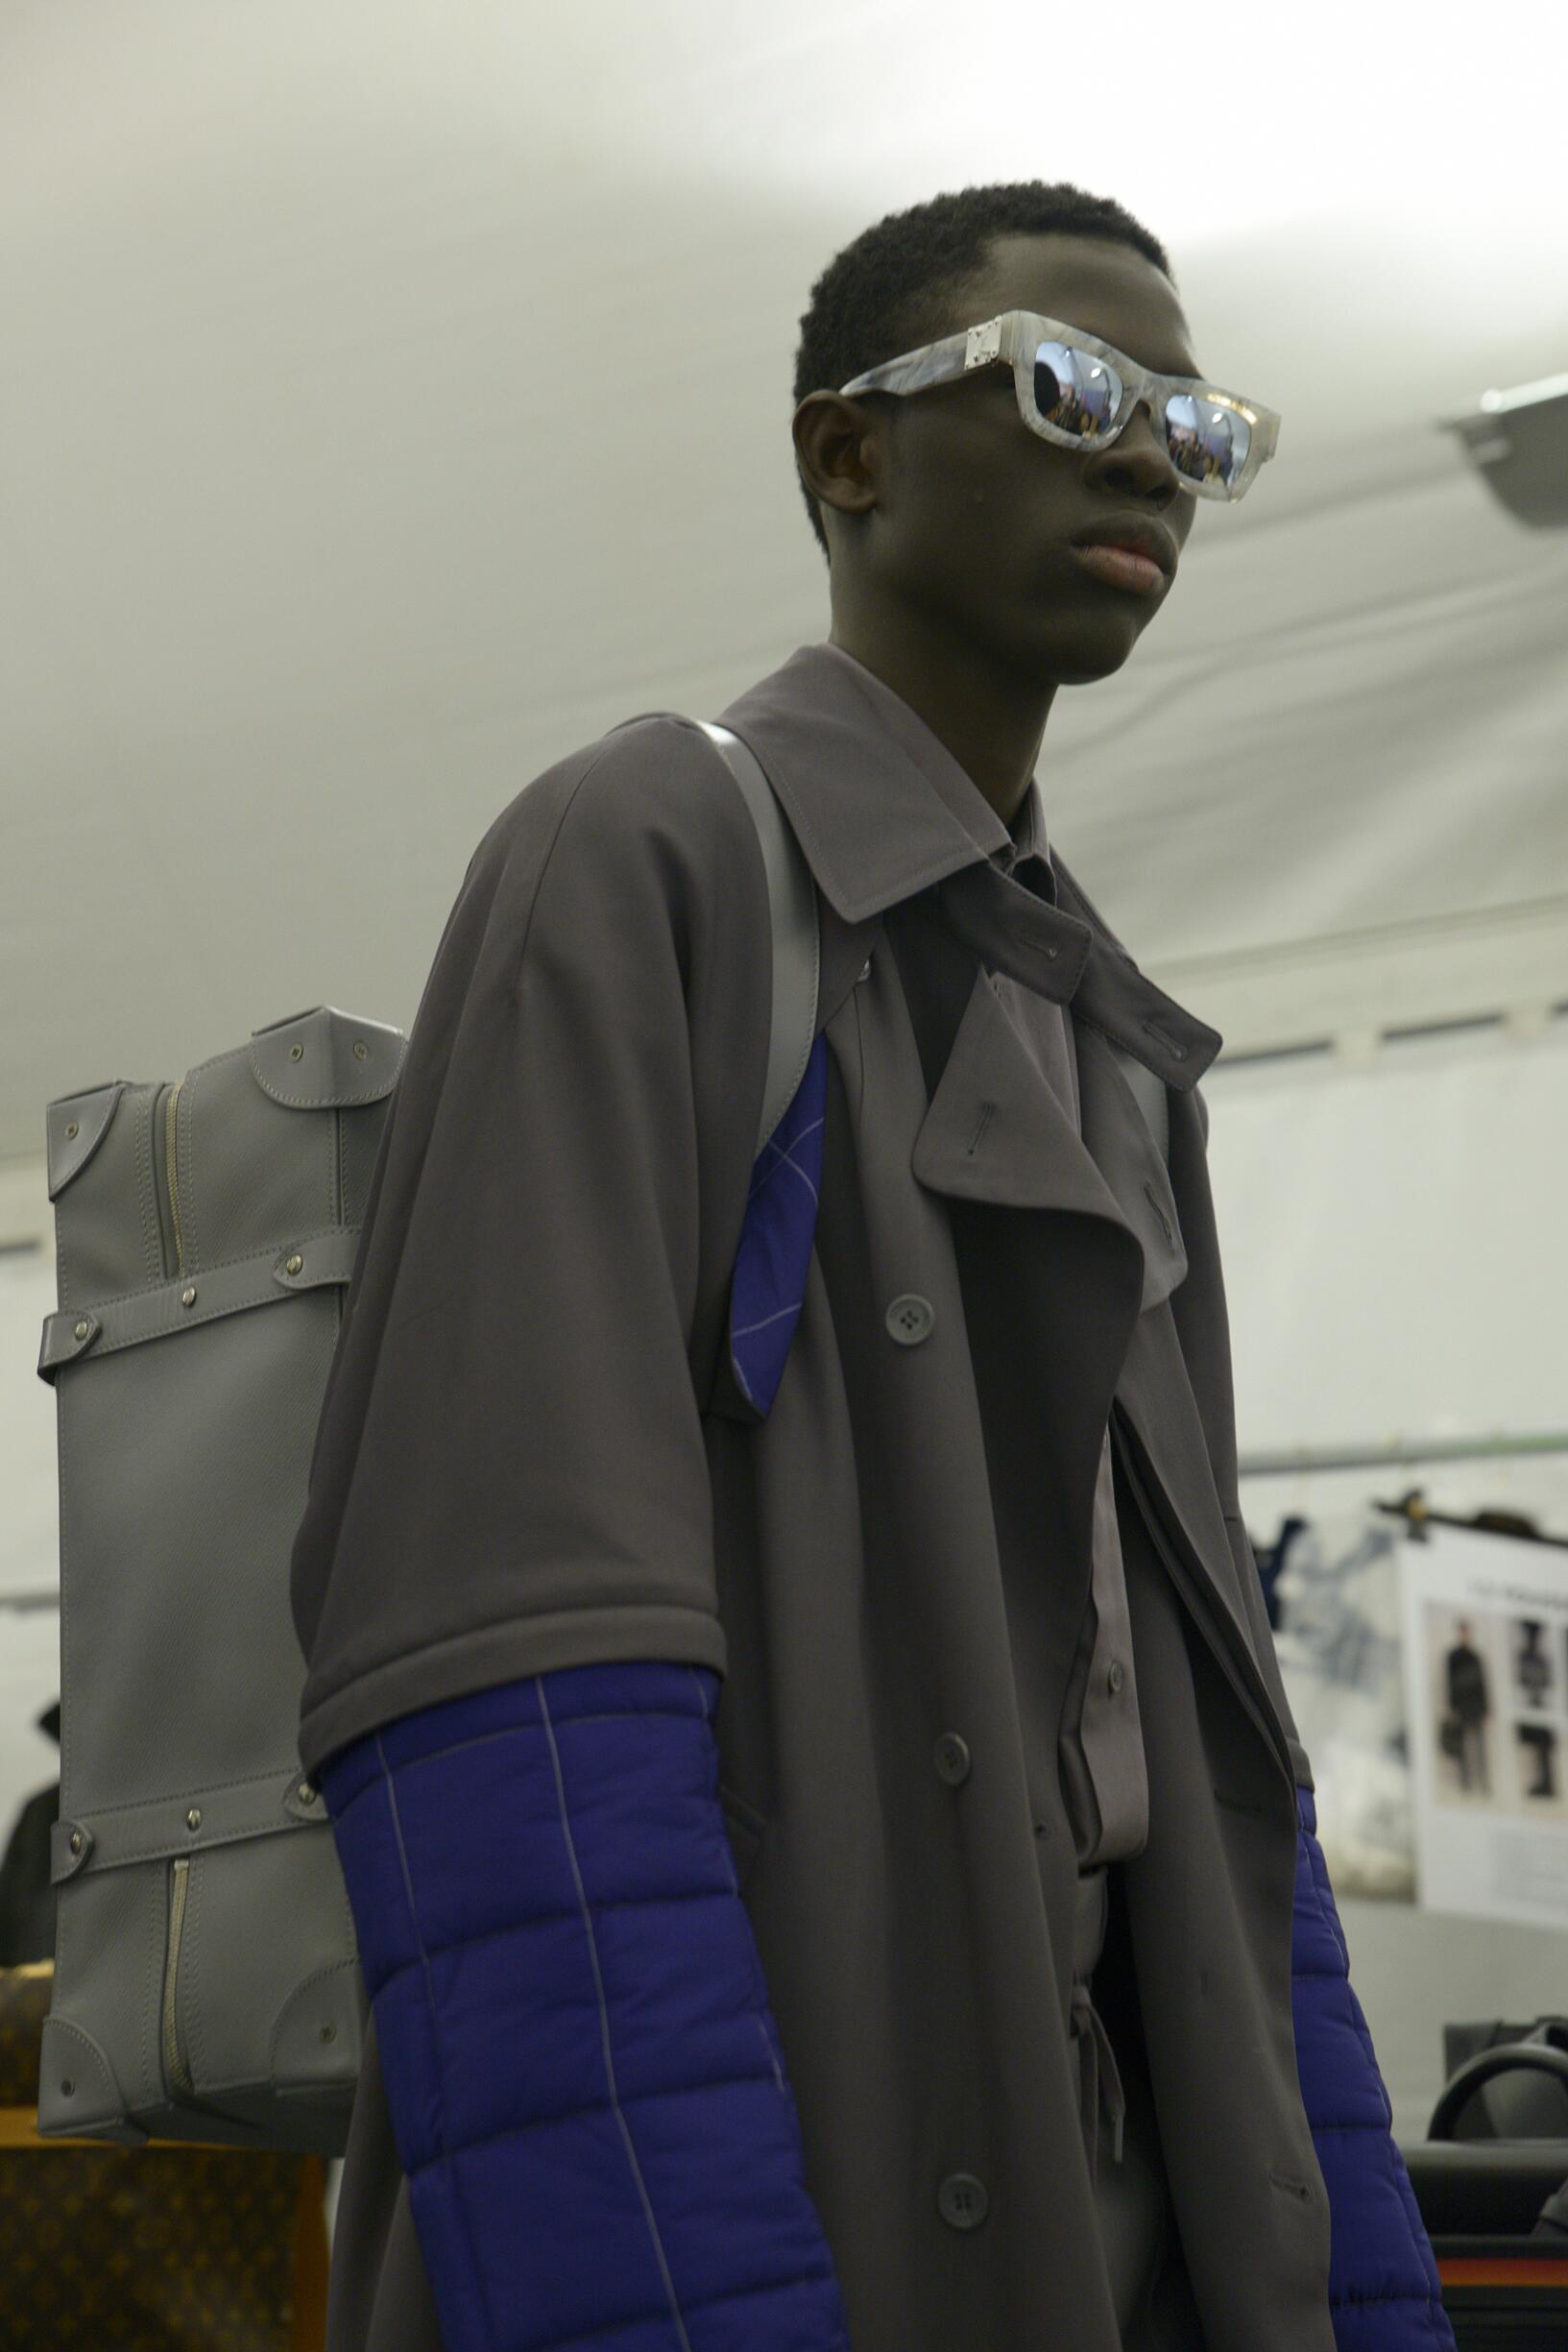 Backstage Louis Vuitton Fashion Trends